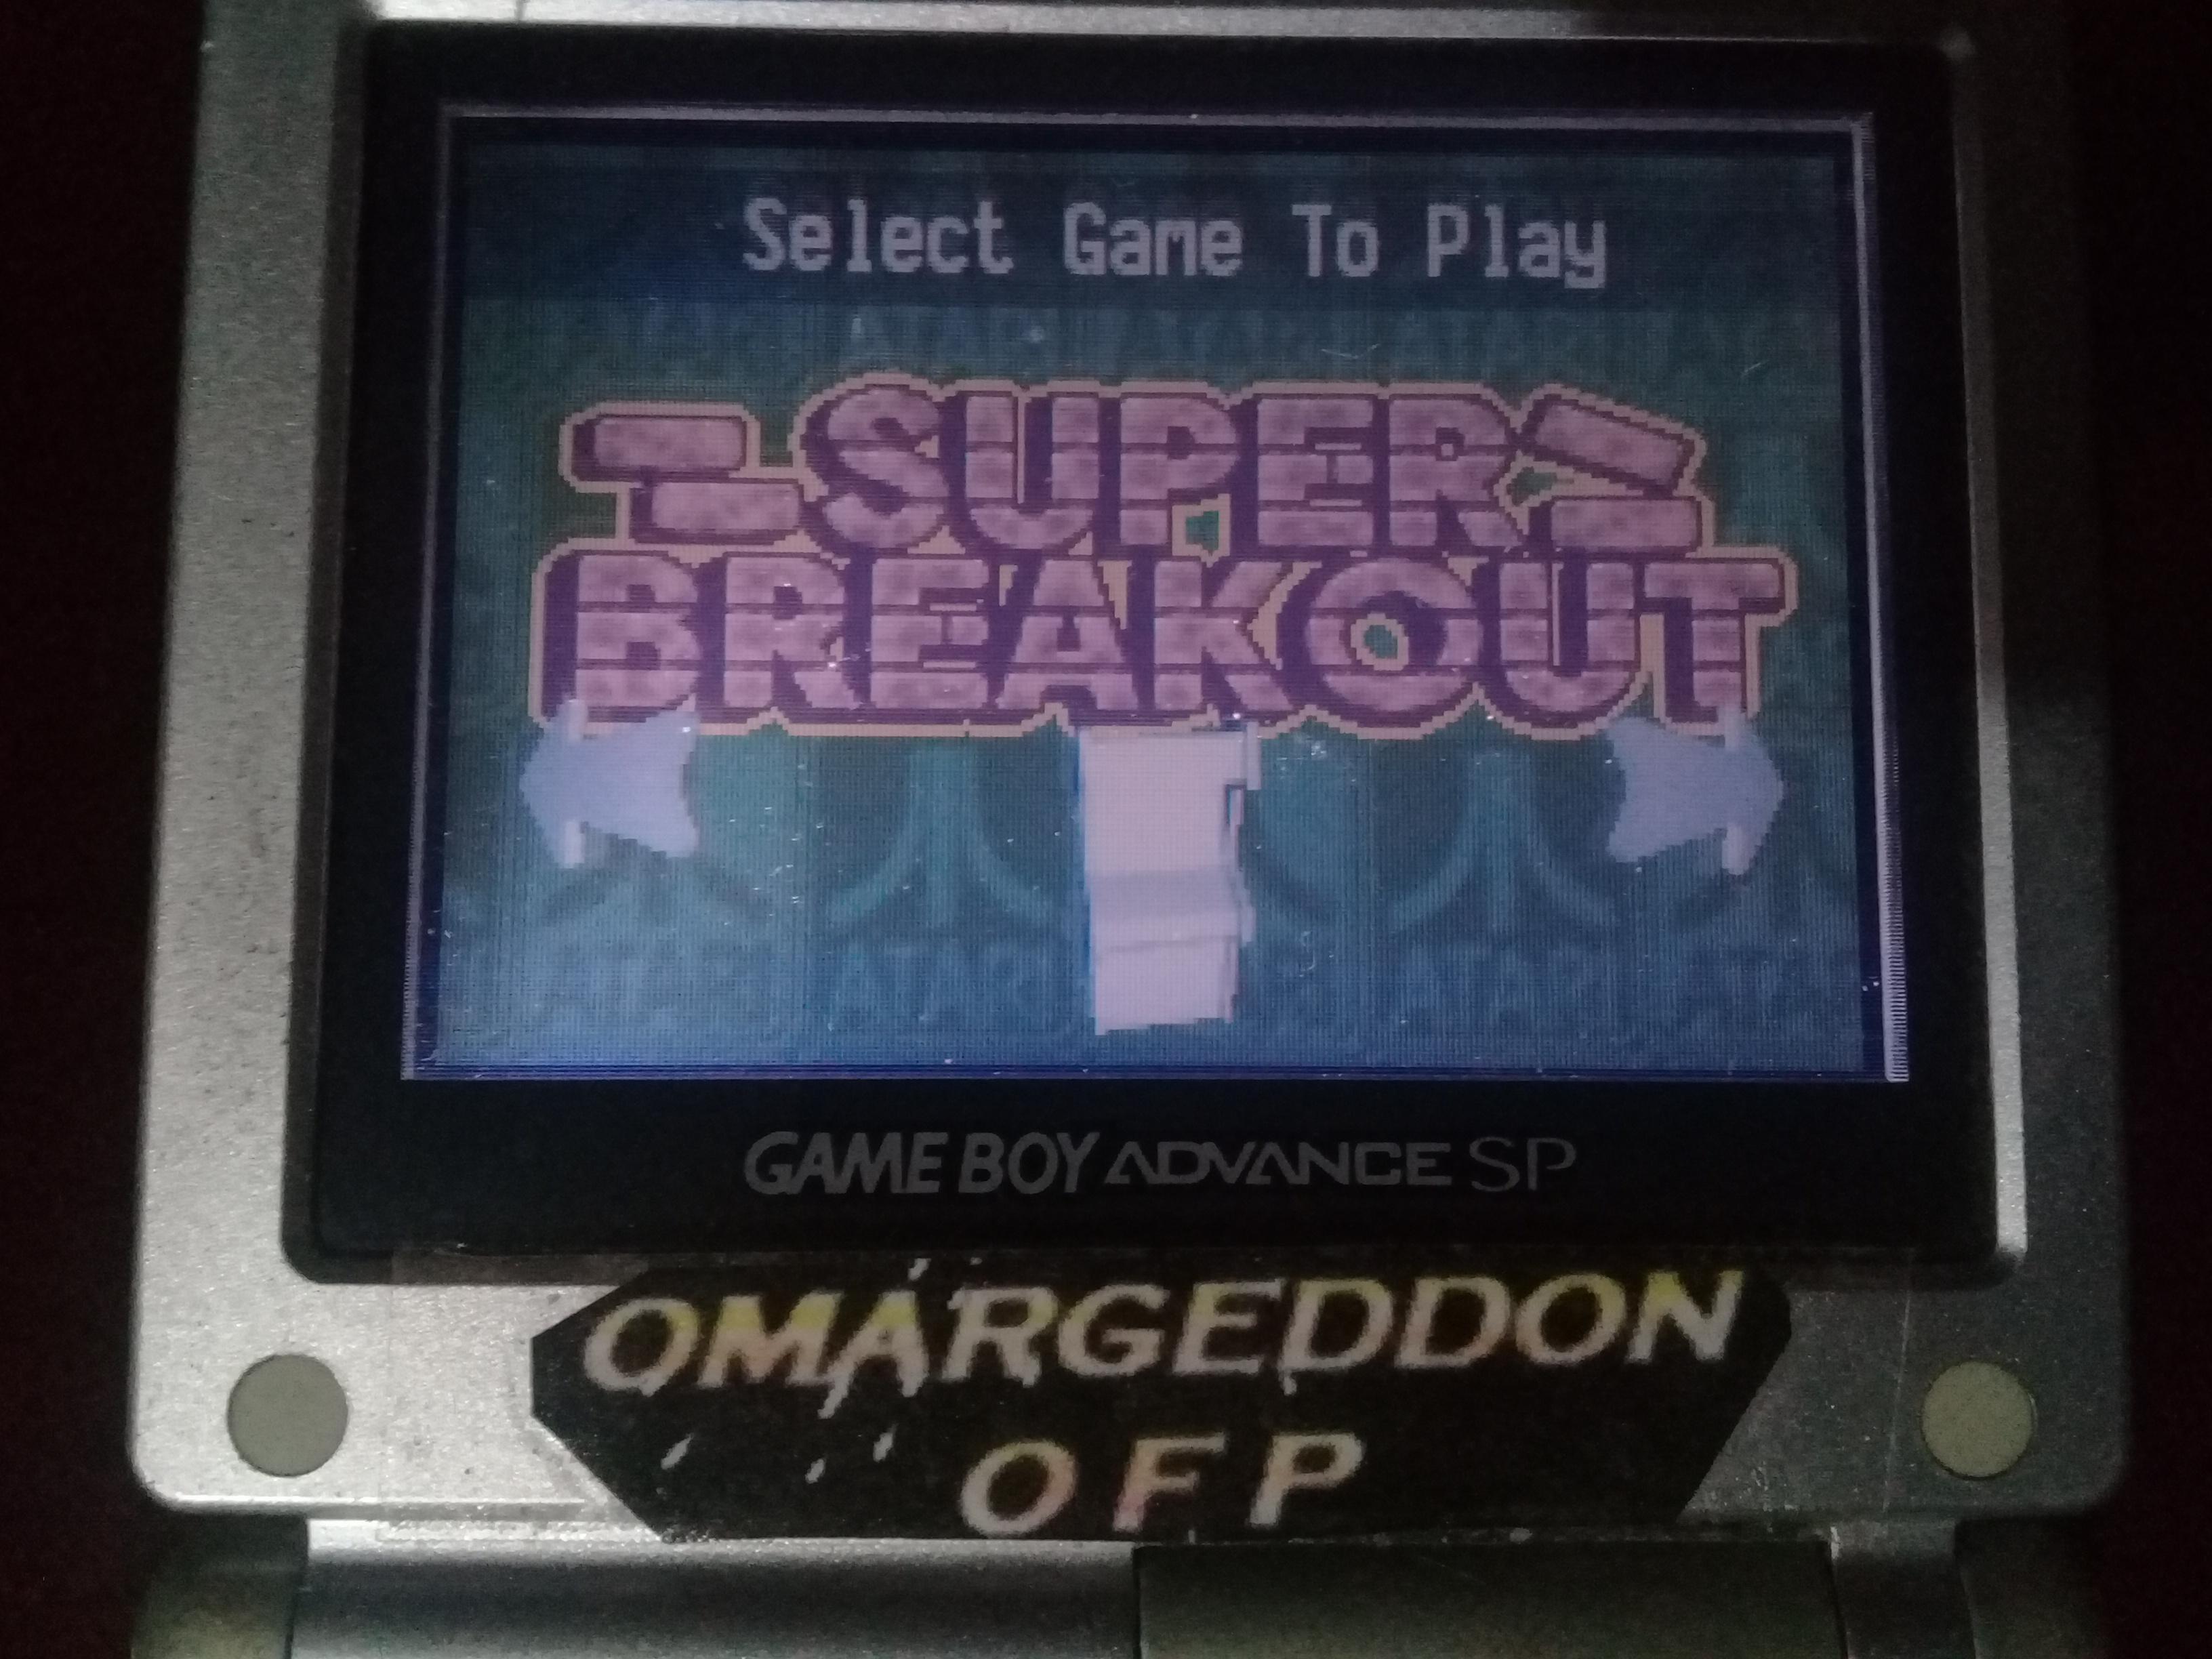 omargeddon: Atari Anniversary Advance: Super Breakout (GBA) 339 points on 2019-10-27 21:12:00